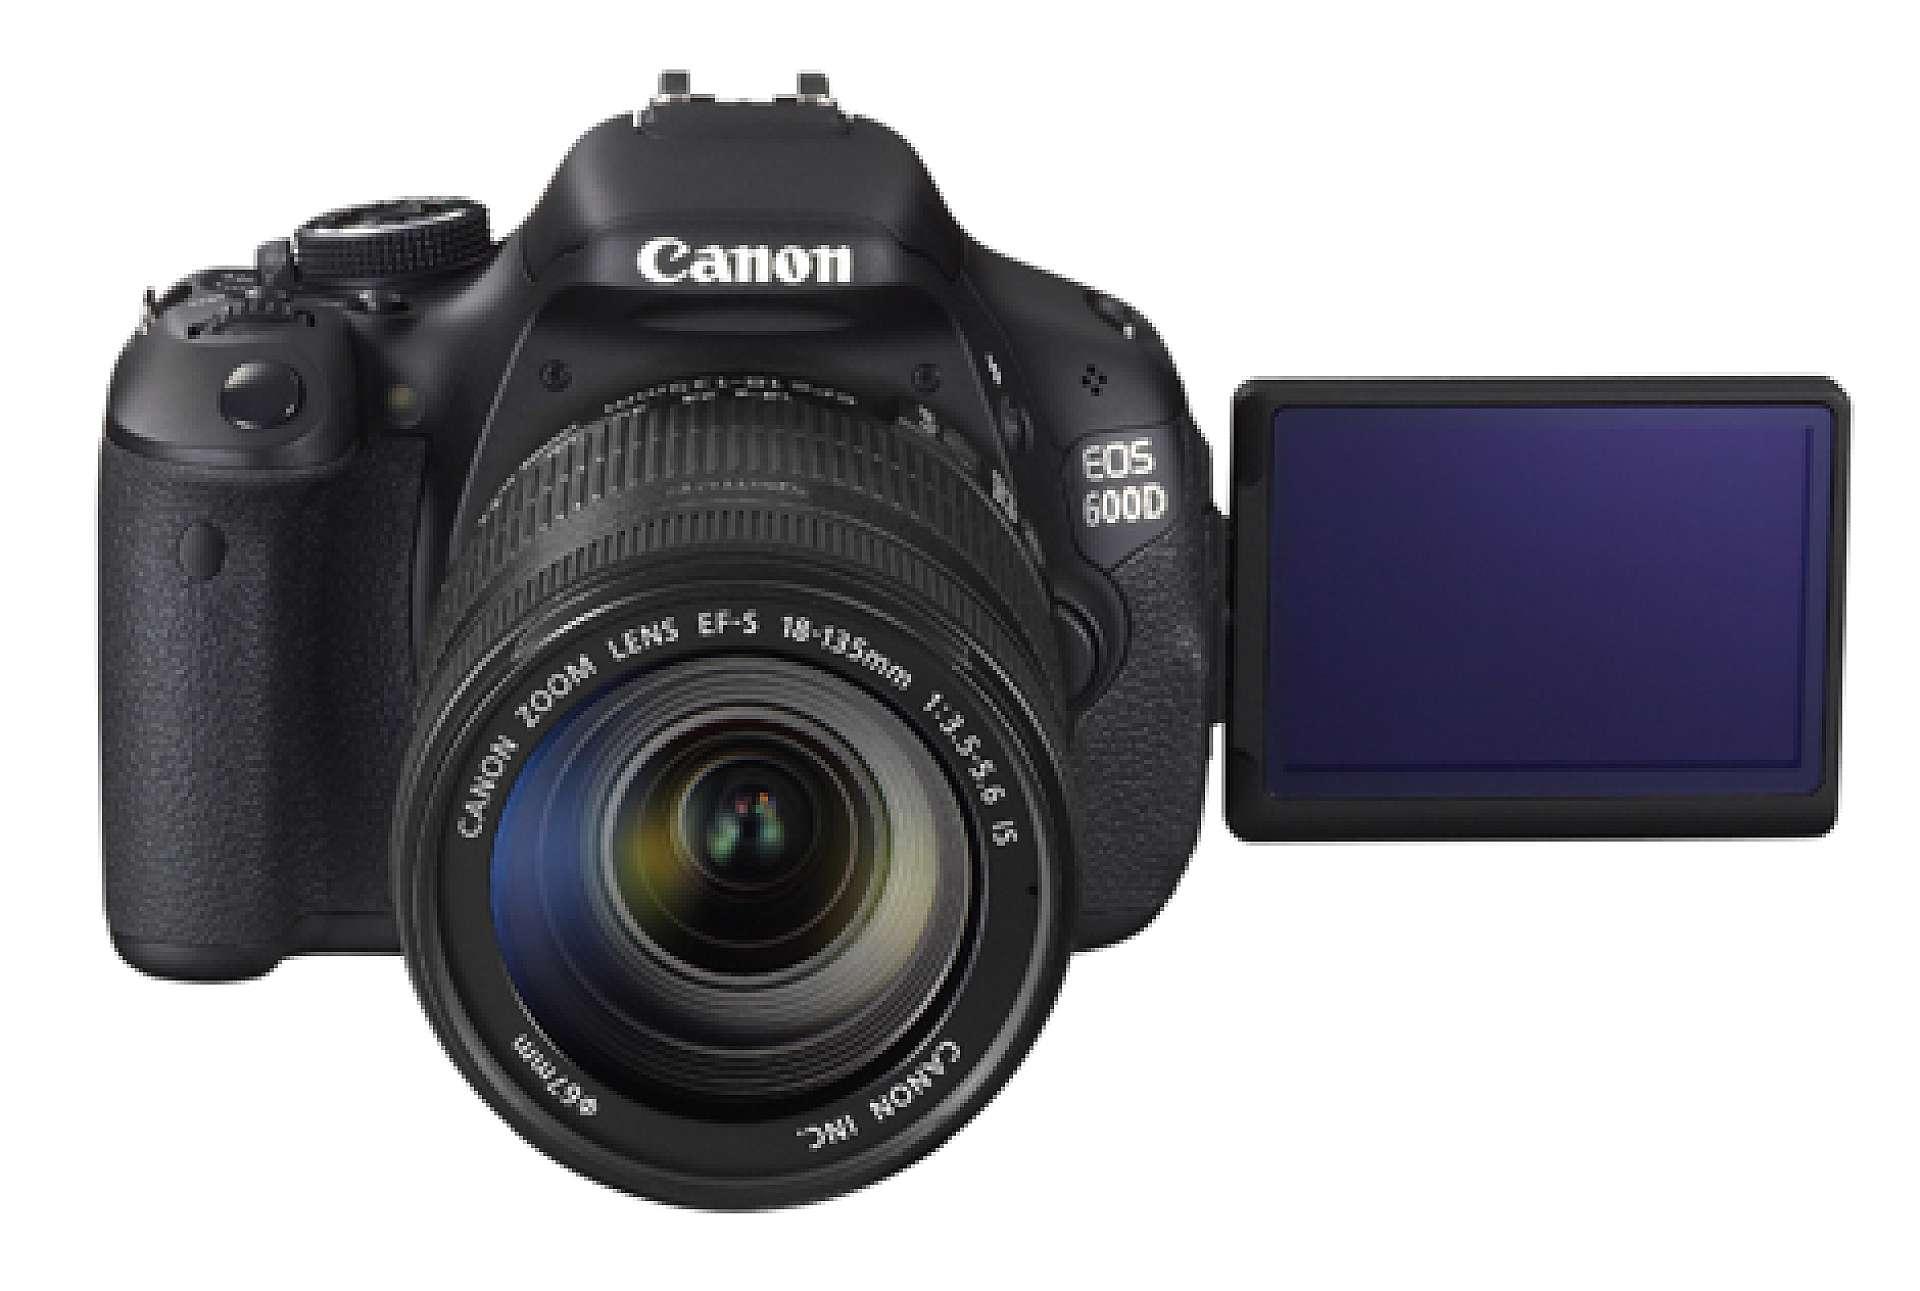 canon eos 600d f r vinkelbar sk rm kamera bild. Black Bedroom Furniture Sets. Home Design Ideas